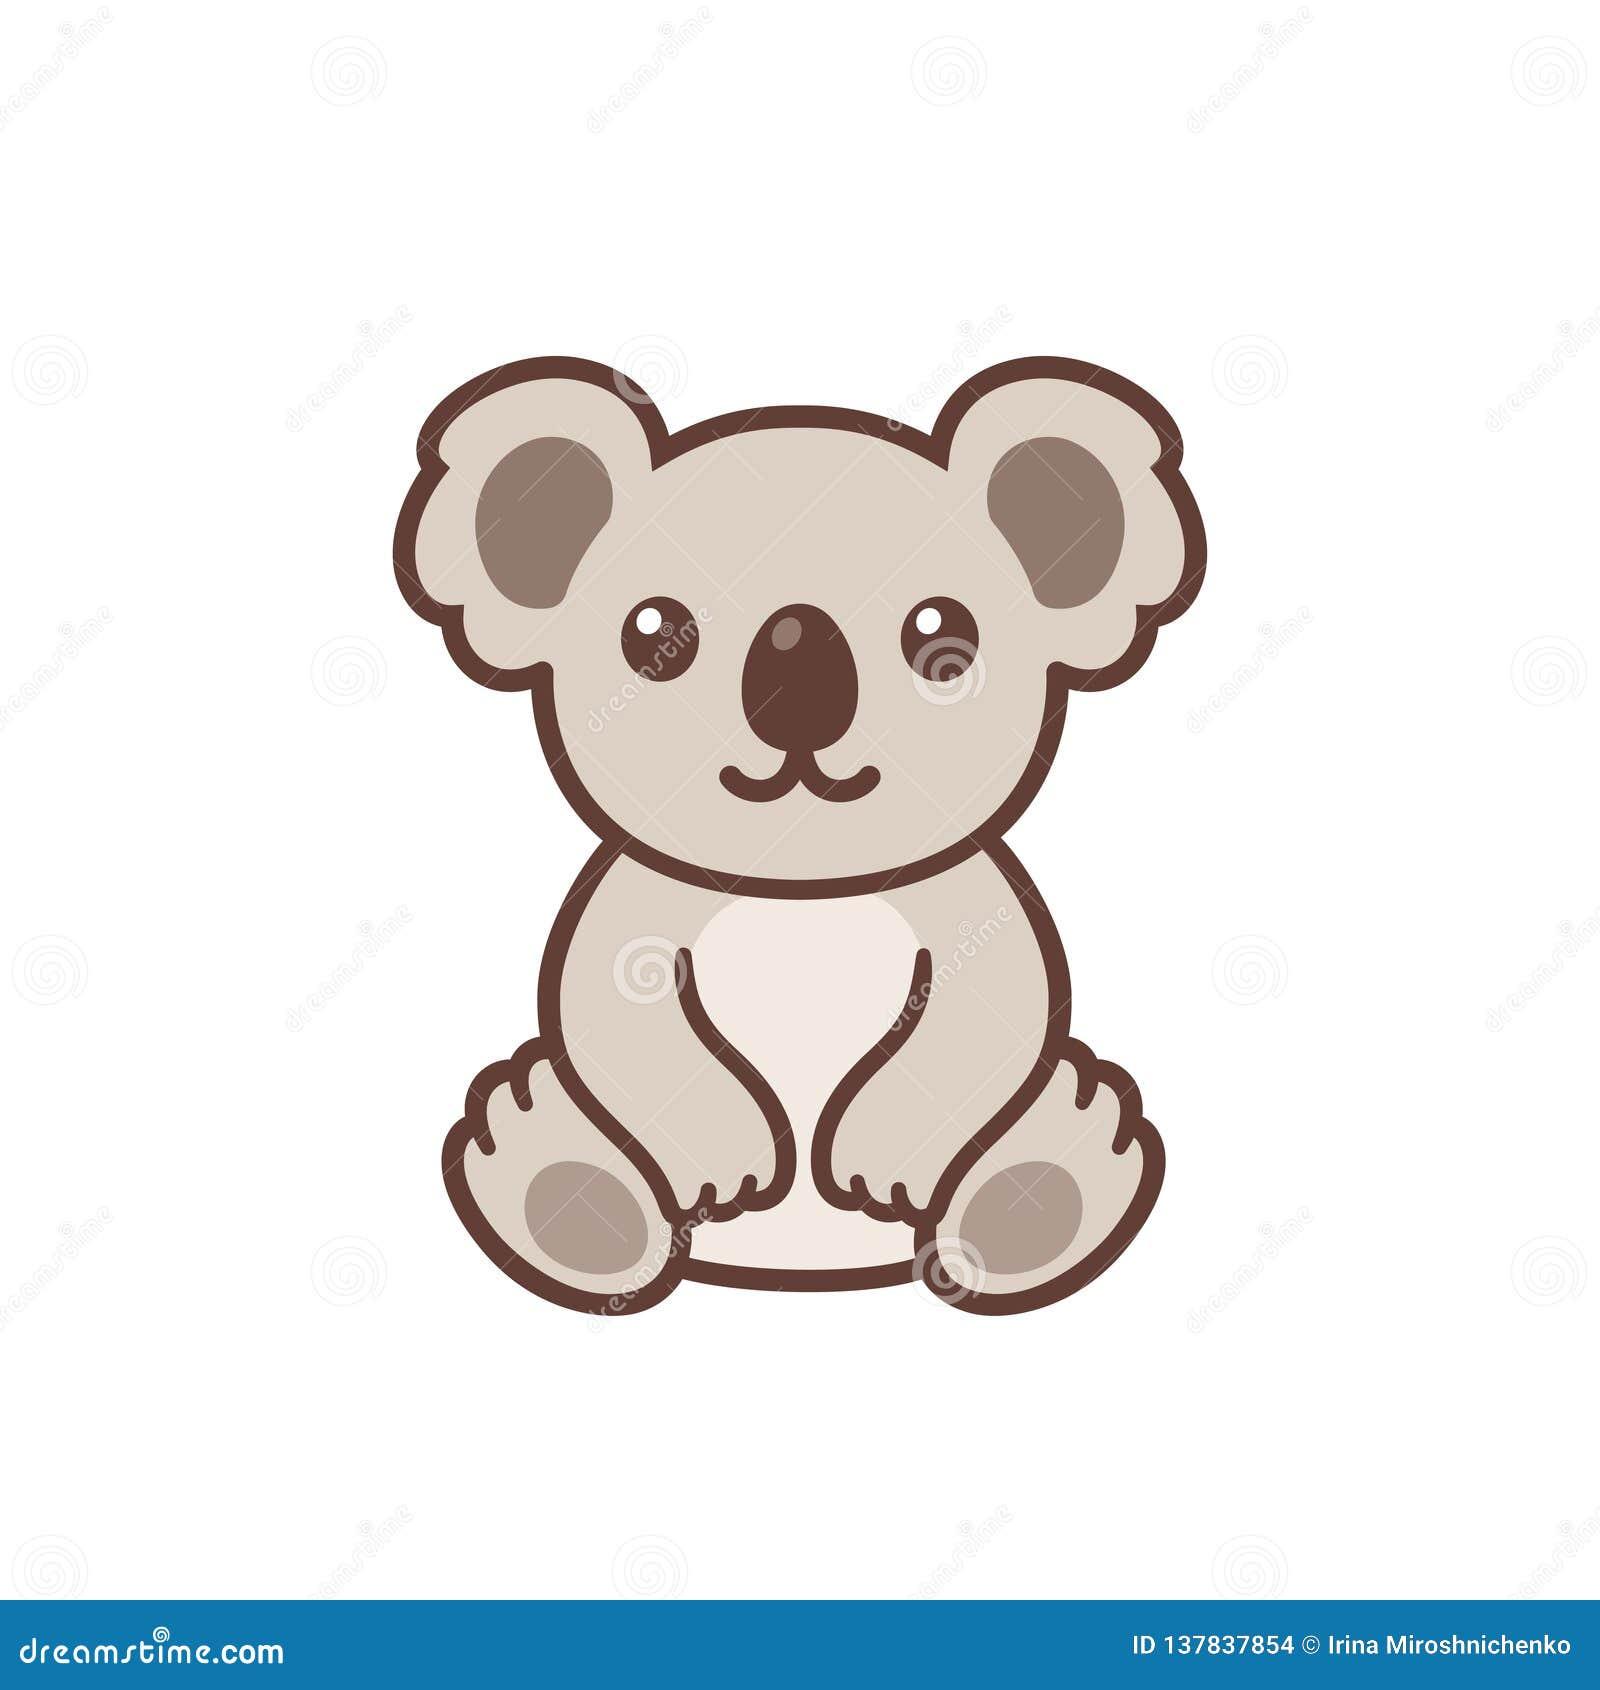 Cool Dessin Koala Facile A Faire - Random Spirit